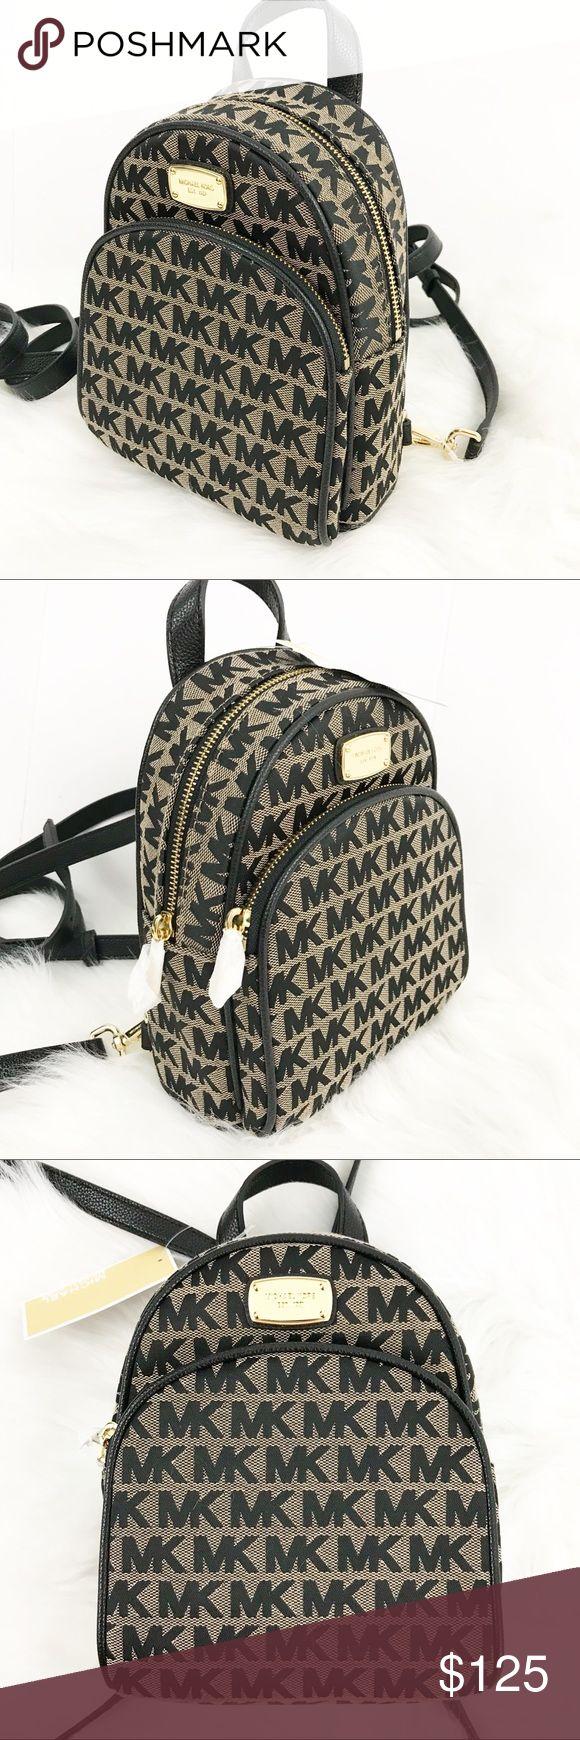 Michael Kors Abbey XSmall Backpack Color: Black & Brown Michael Kors Bags Backpacks